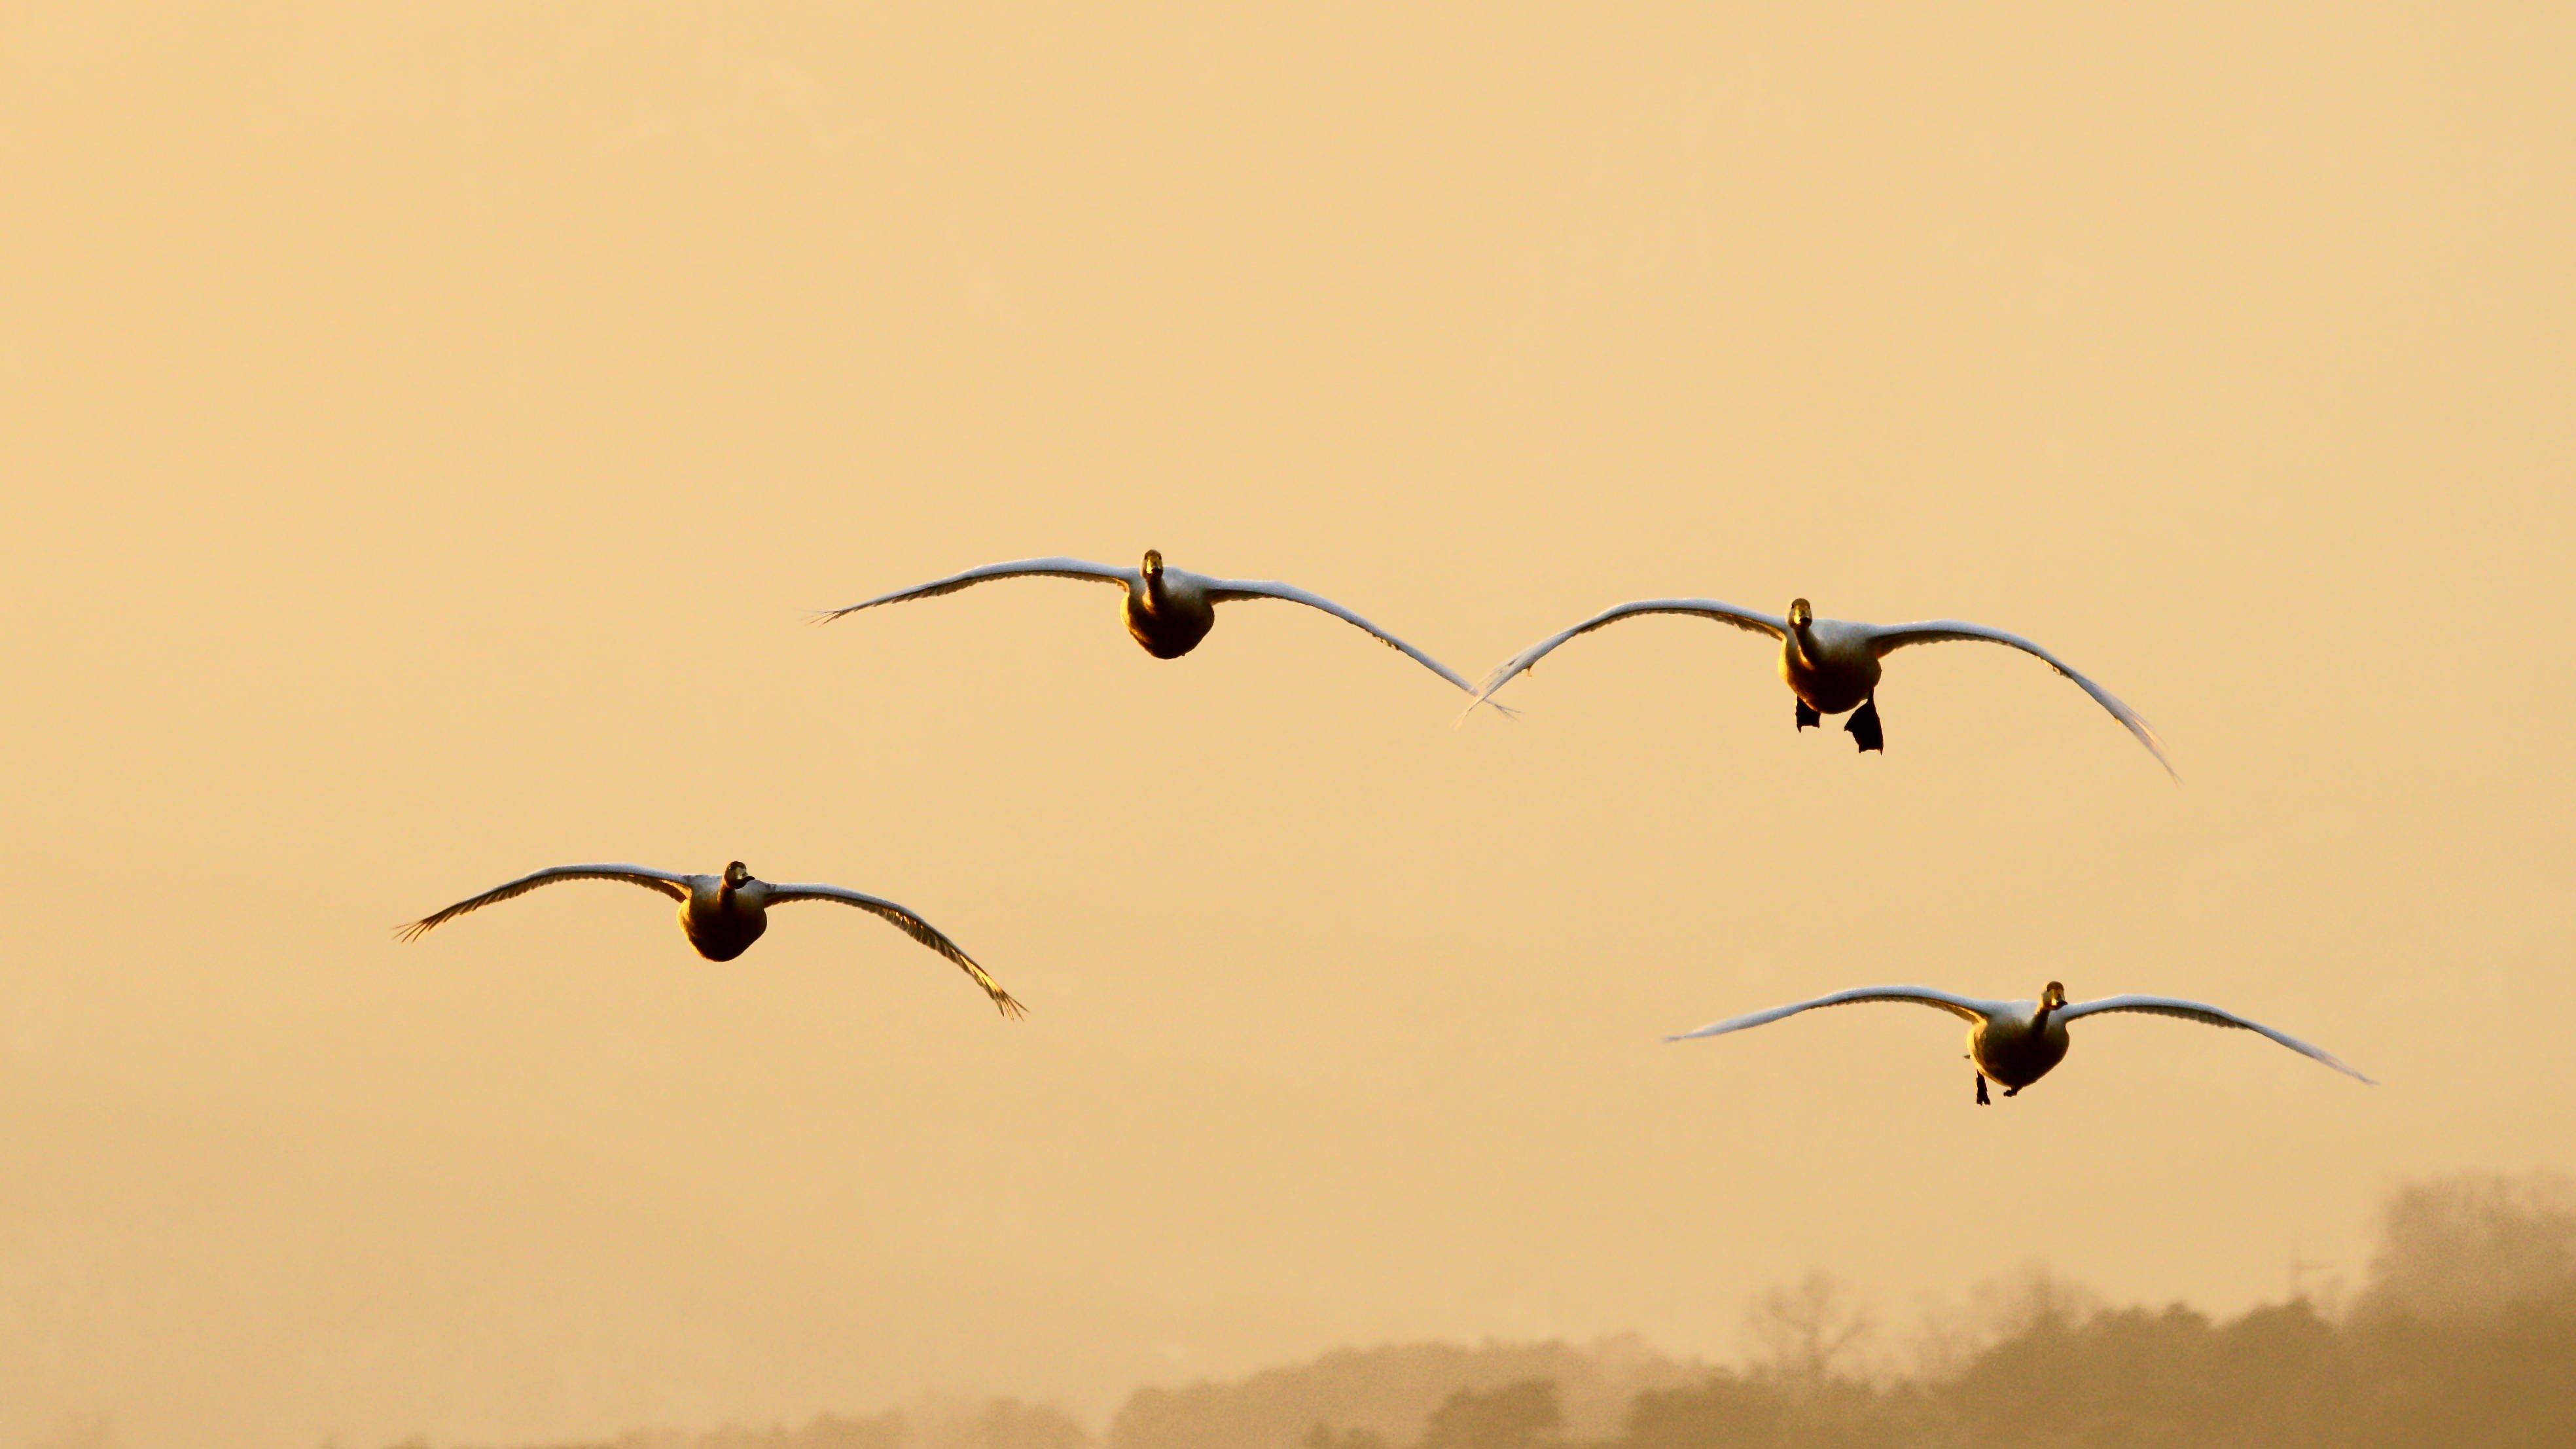 south korea, gyeonggido, winter, sunset, swan, animal, bird, sky, light,, Shin